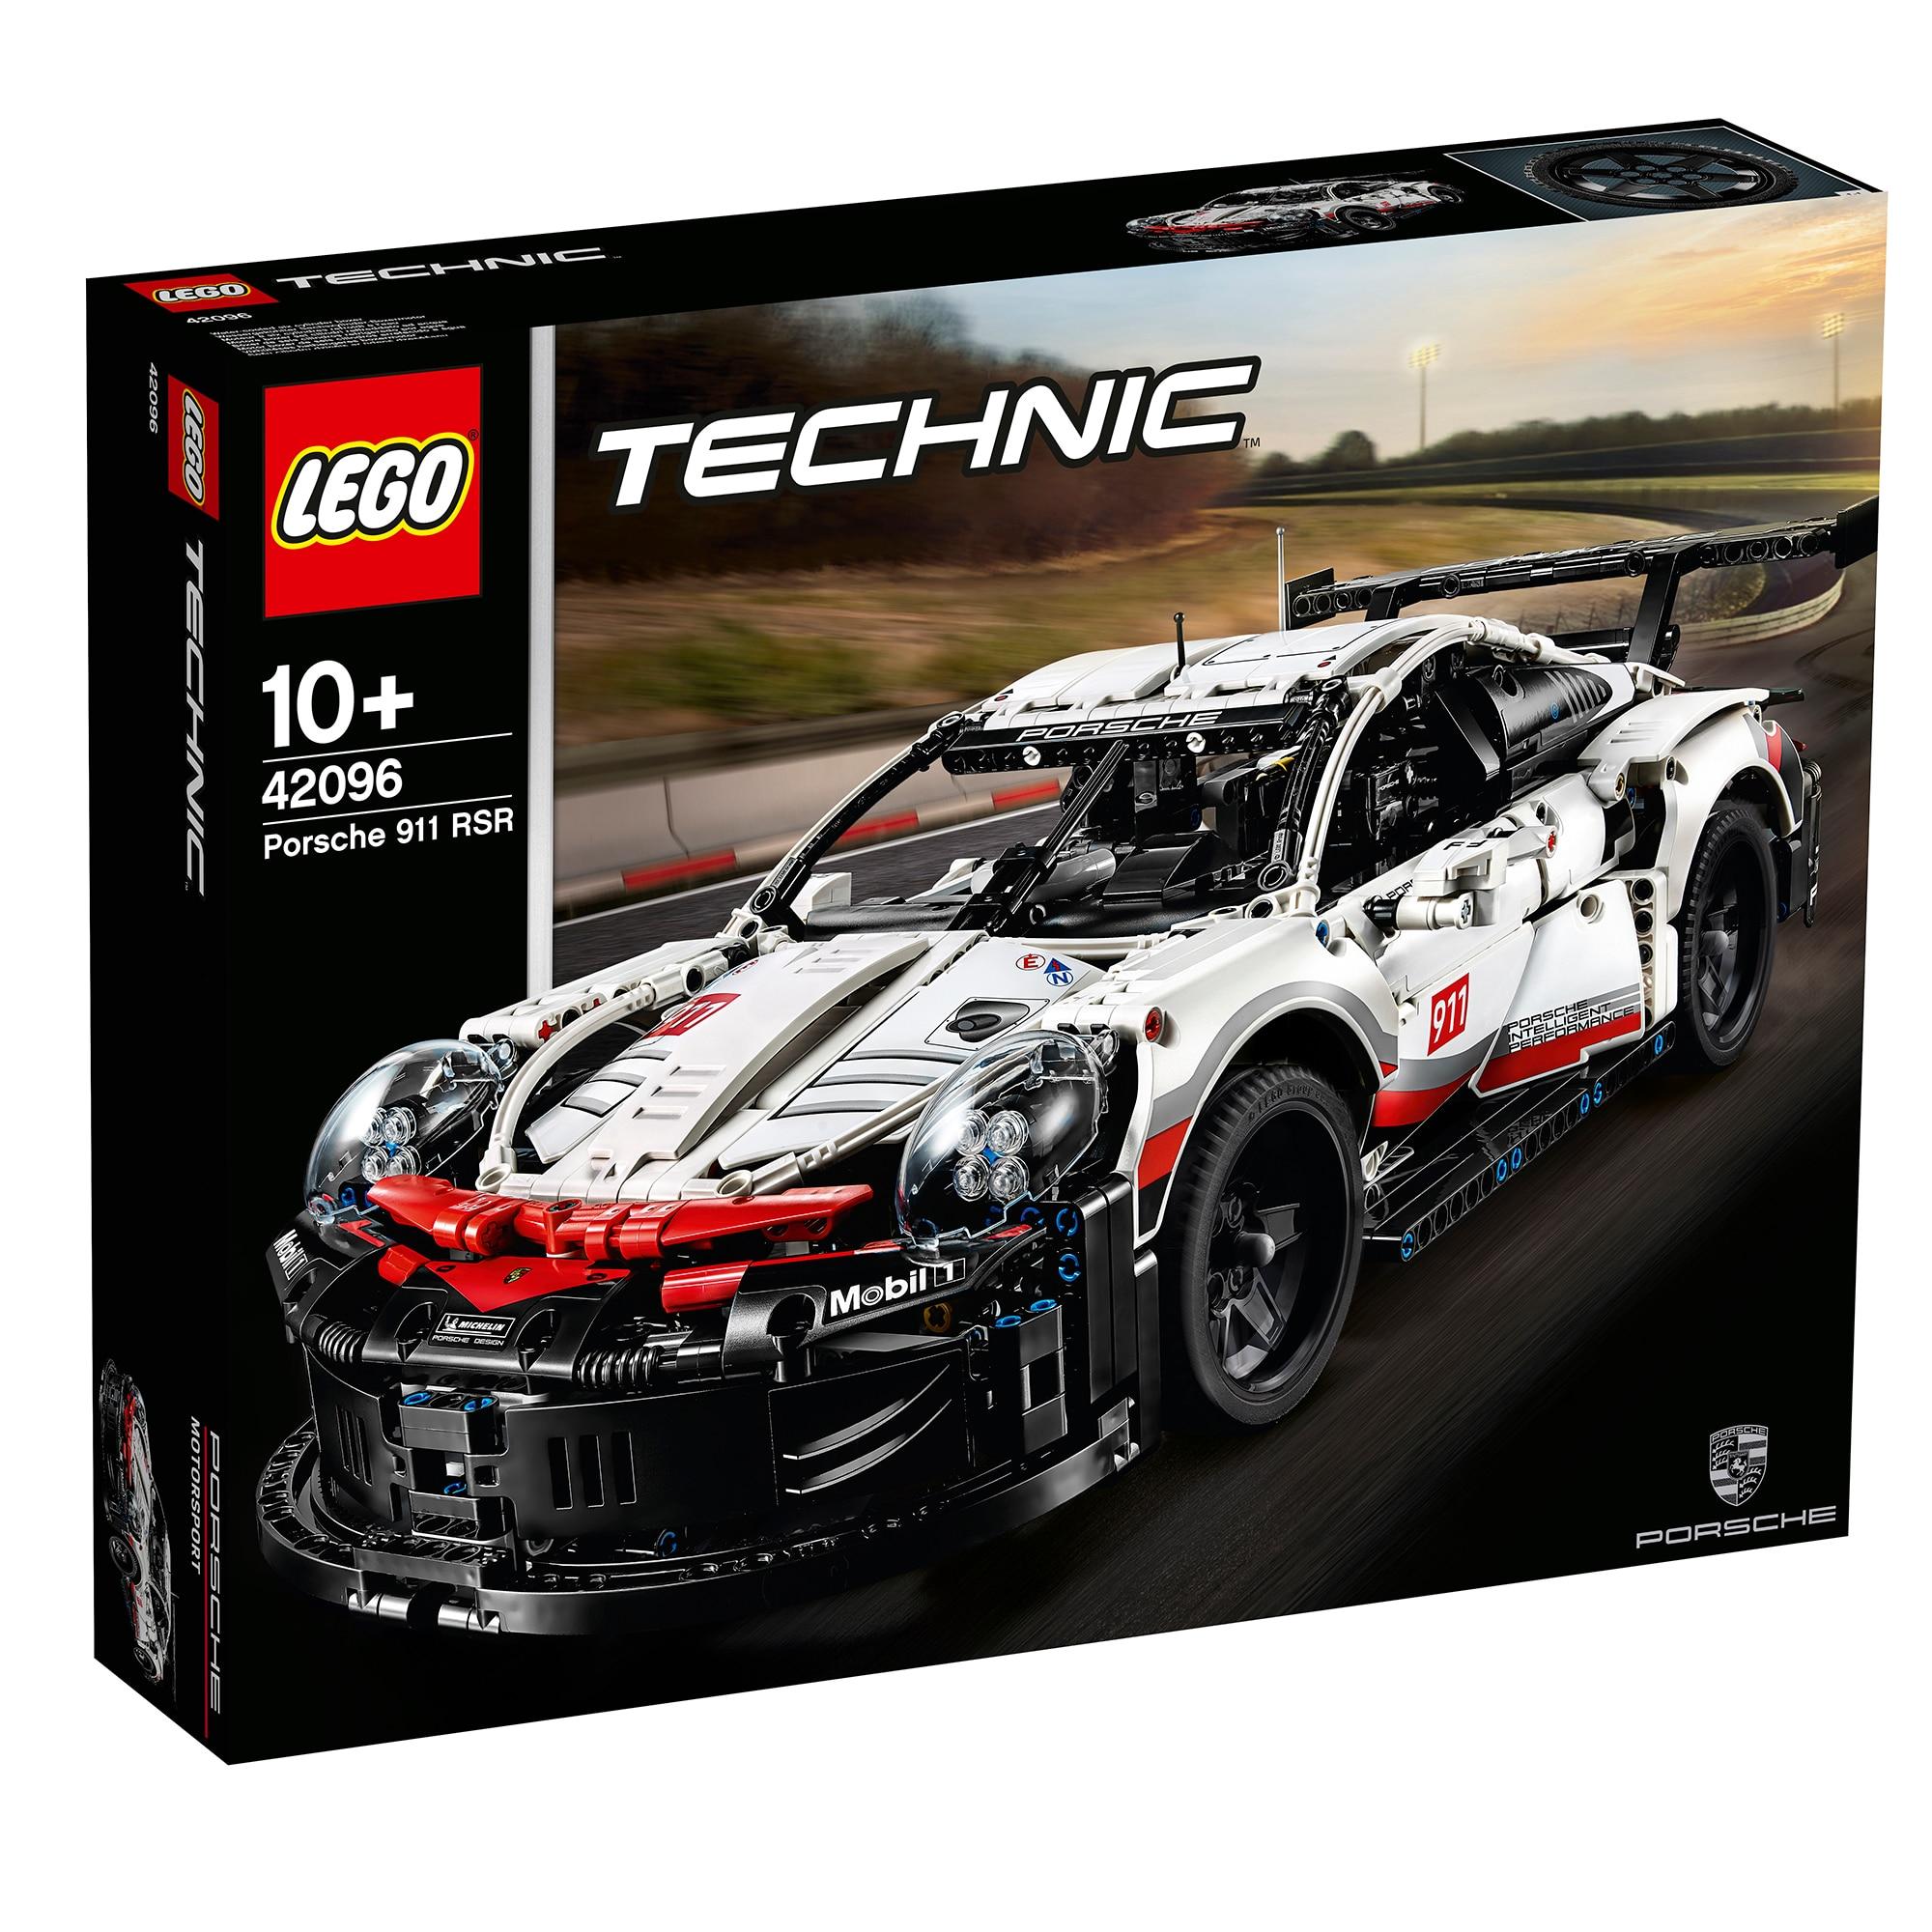 Fotografie LEGO Technic - Porsche 911 RSR 42096